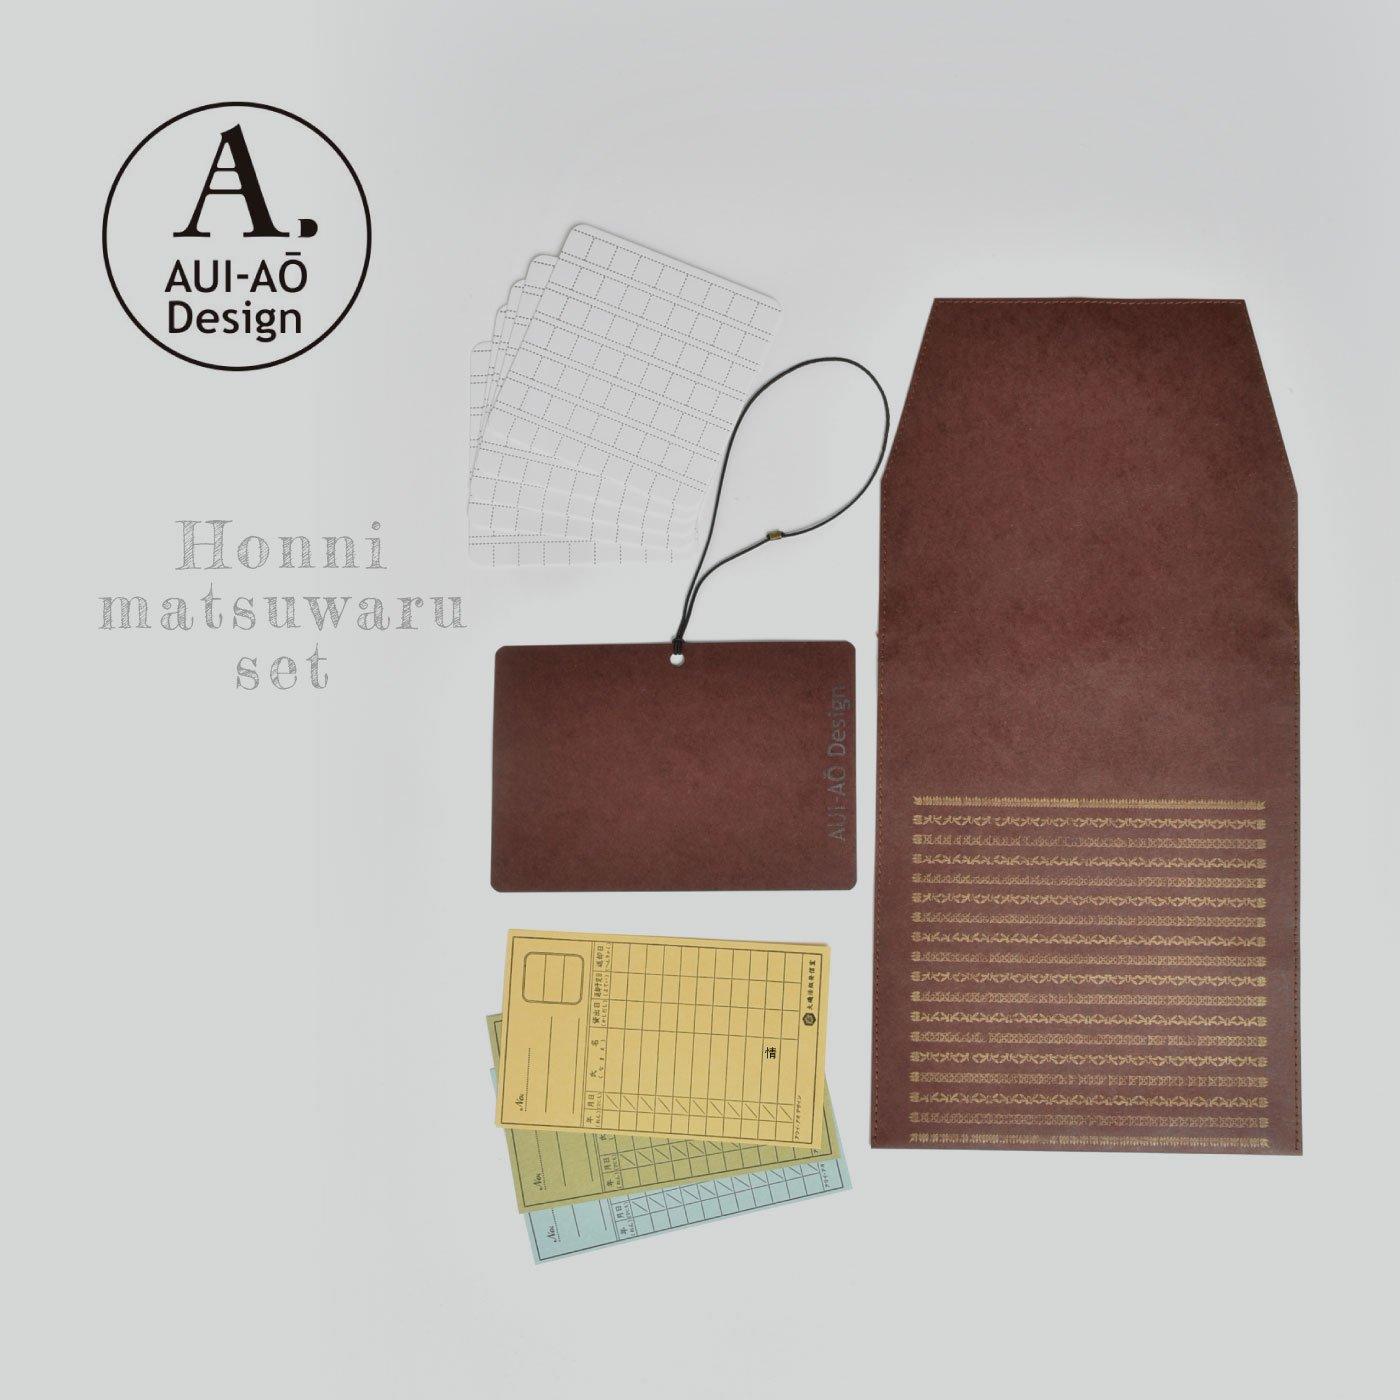 AUI-AO Design 本にまつわるセット